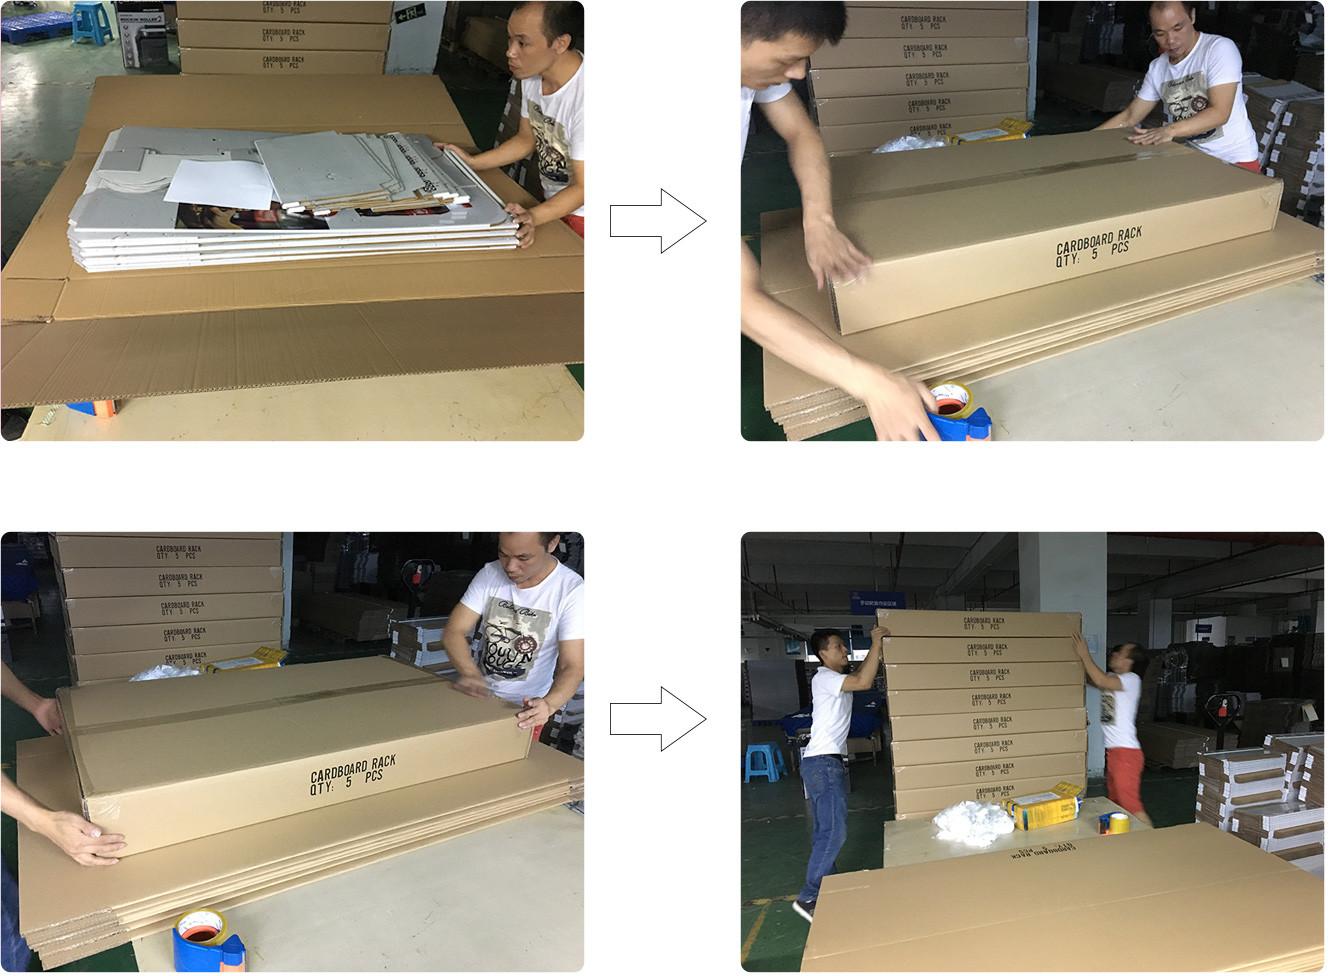 SAFEKA -Hot-sale Supermarkets Custom Promotional Cardboard Floor Display-3